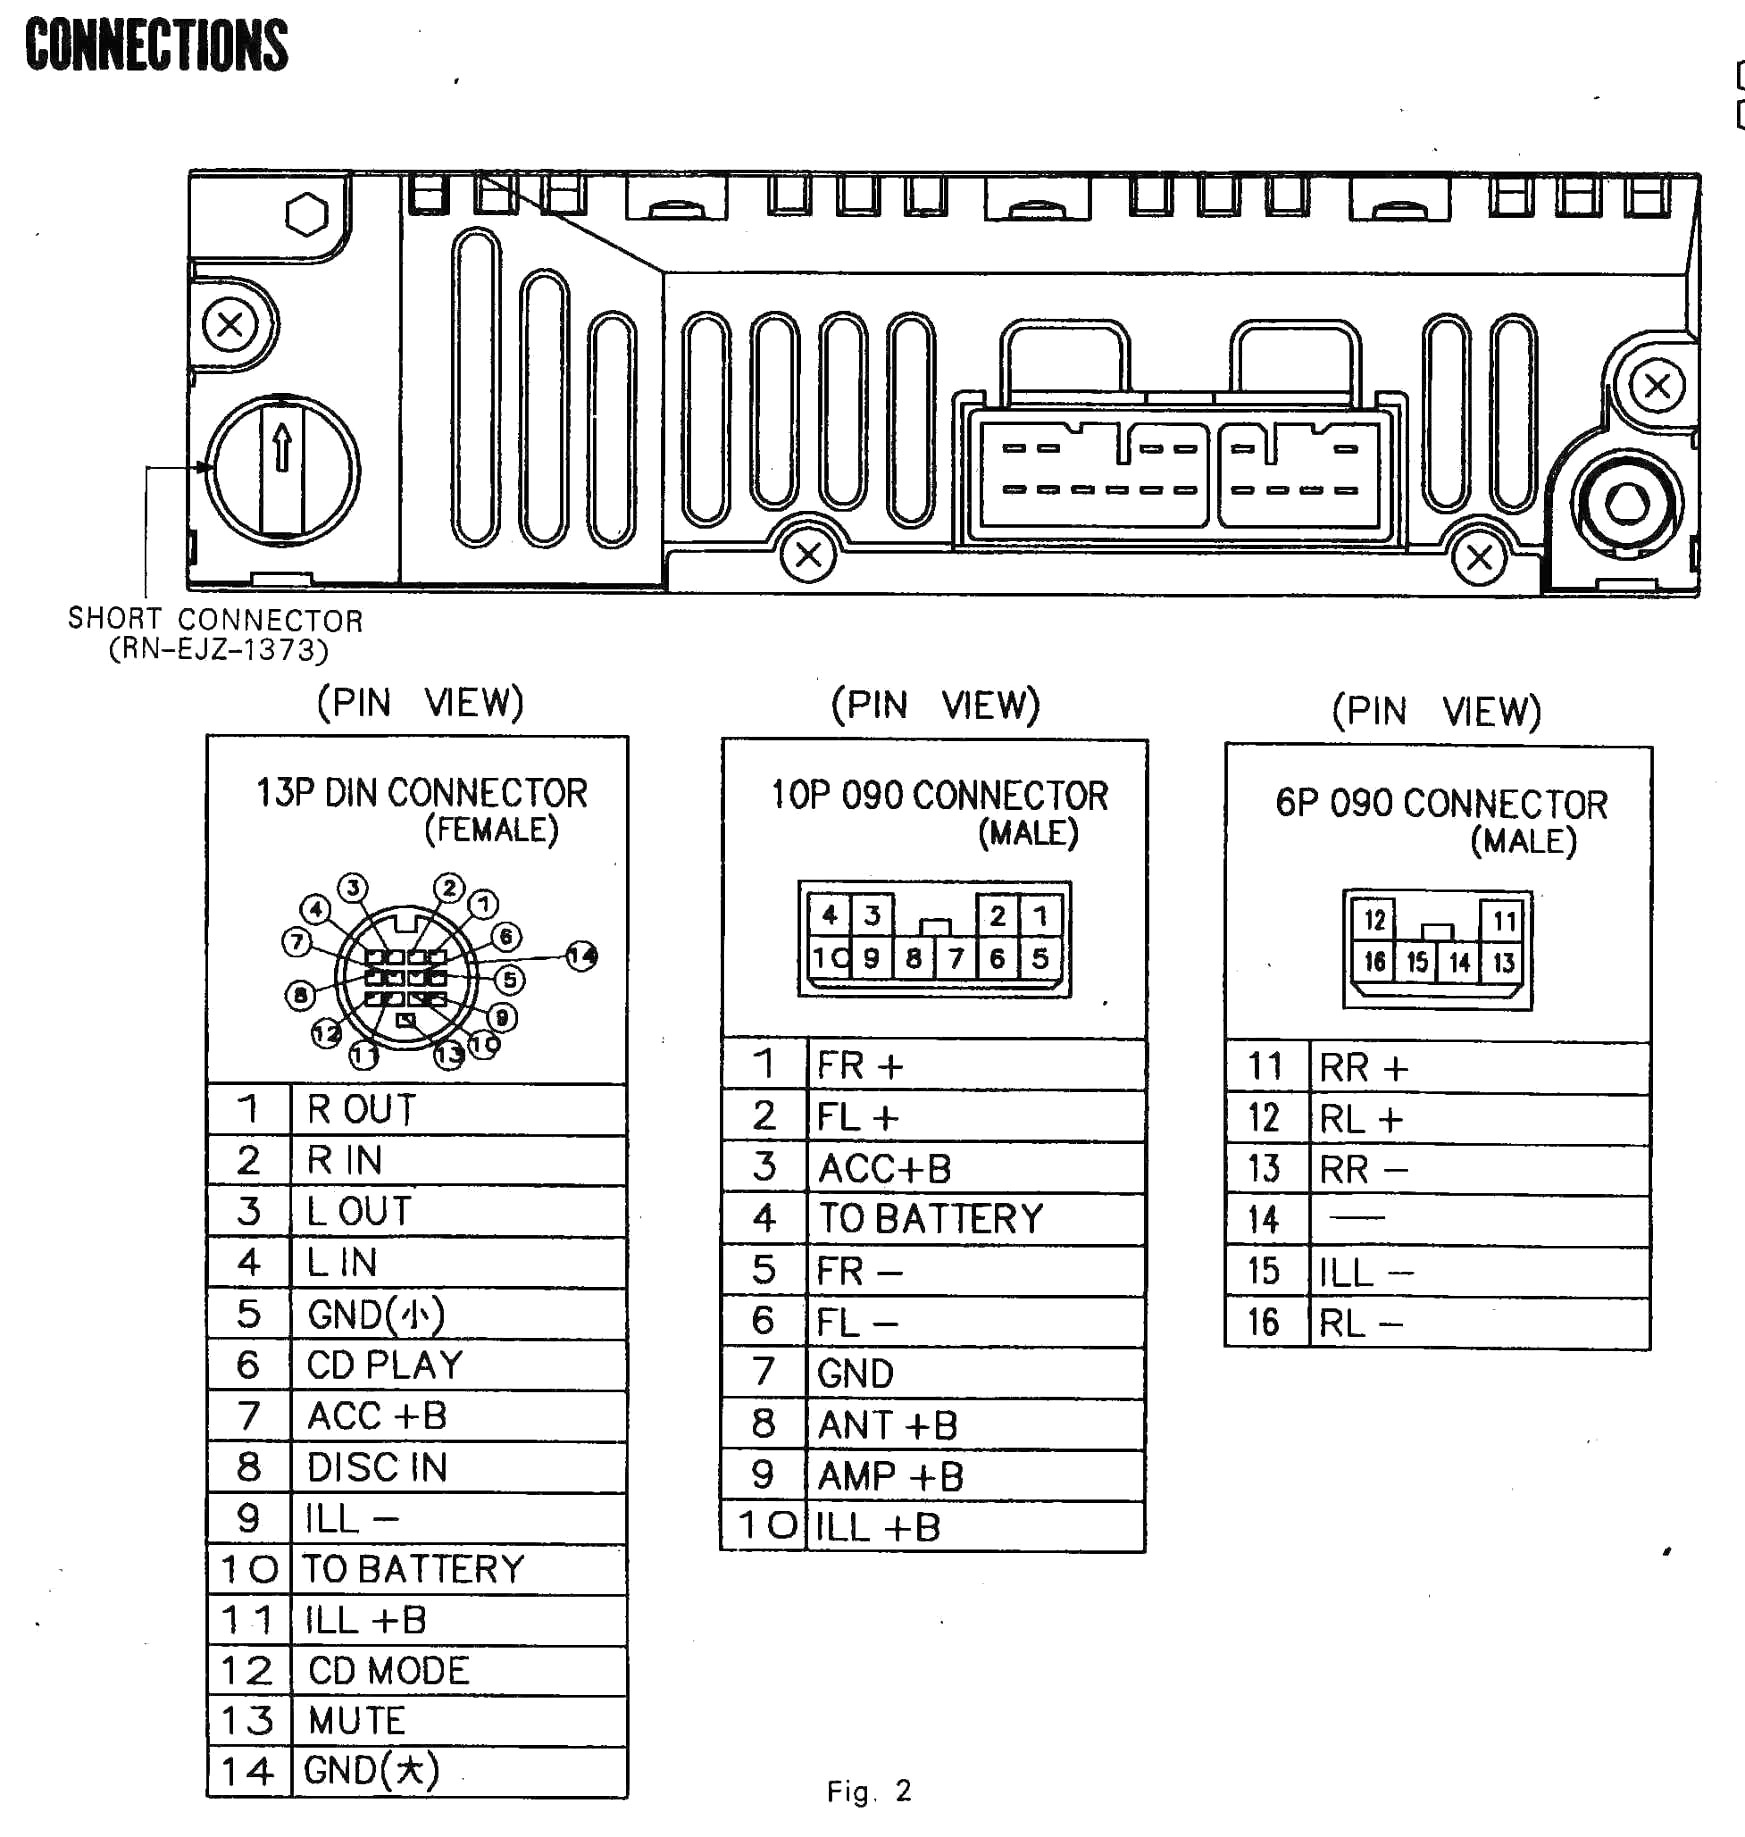 09 jetta wiring diagrams 2000 vw    jetta    stereo    wiring       diagram    free    wiring       diagram     2000 vw    jetta    stereo    wiring       diagram    free    wiring       diagram